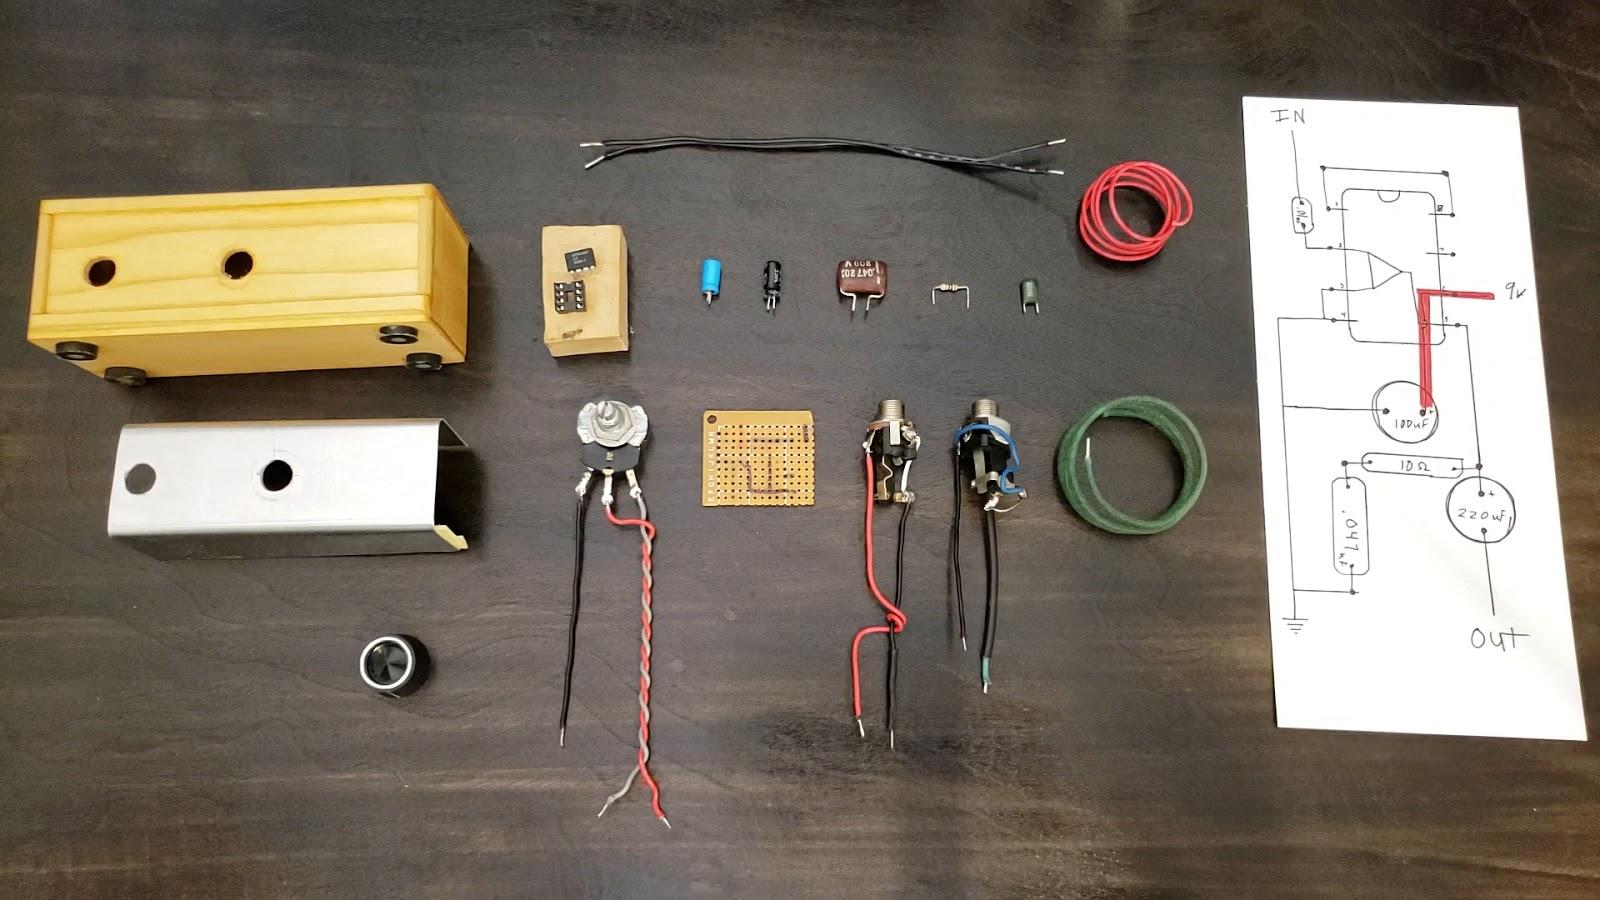 10 ohm resistor 1 2 watt rating 220uf capacitor electrolytic 16v 100uf capacitor electrolytic 16v 047 capacitor film type 16v or higher depending on  [ 1600 x 900 Pixel ]